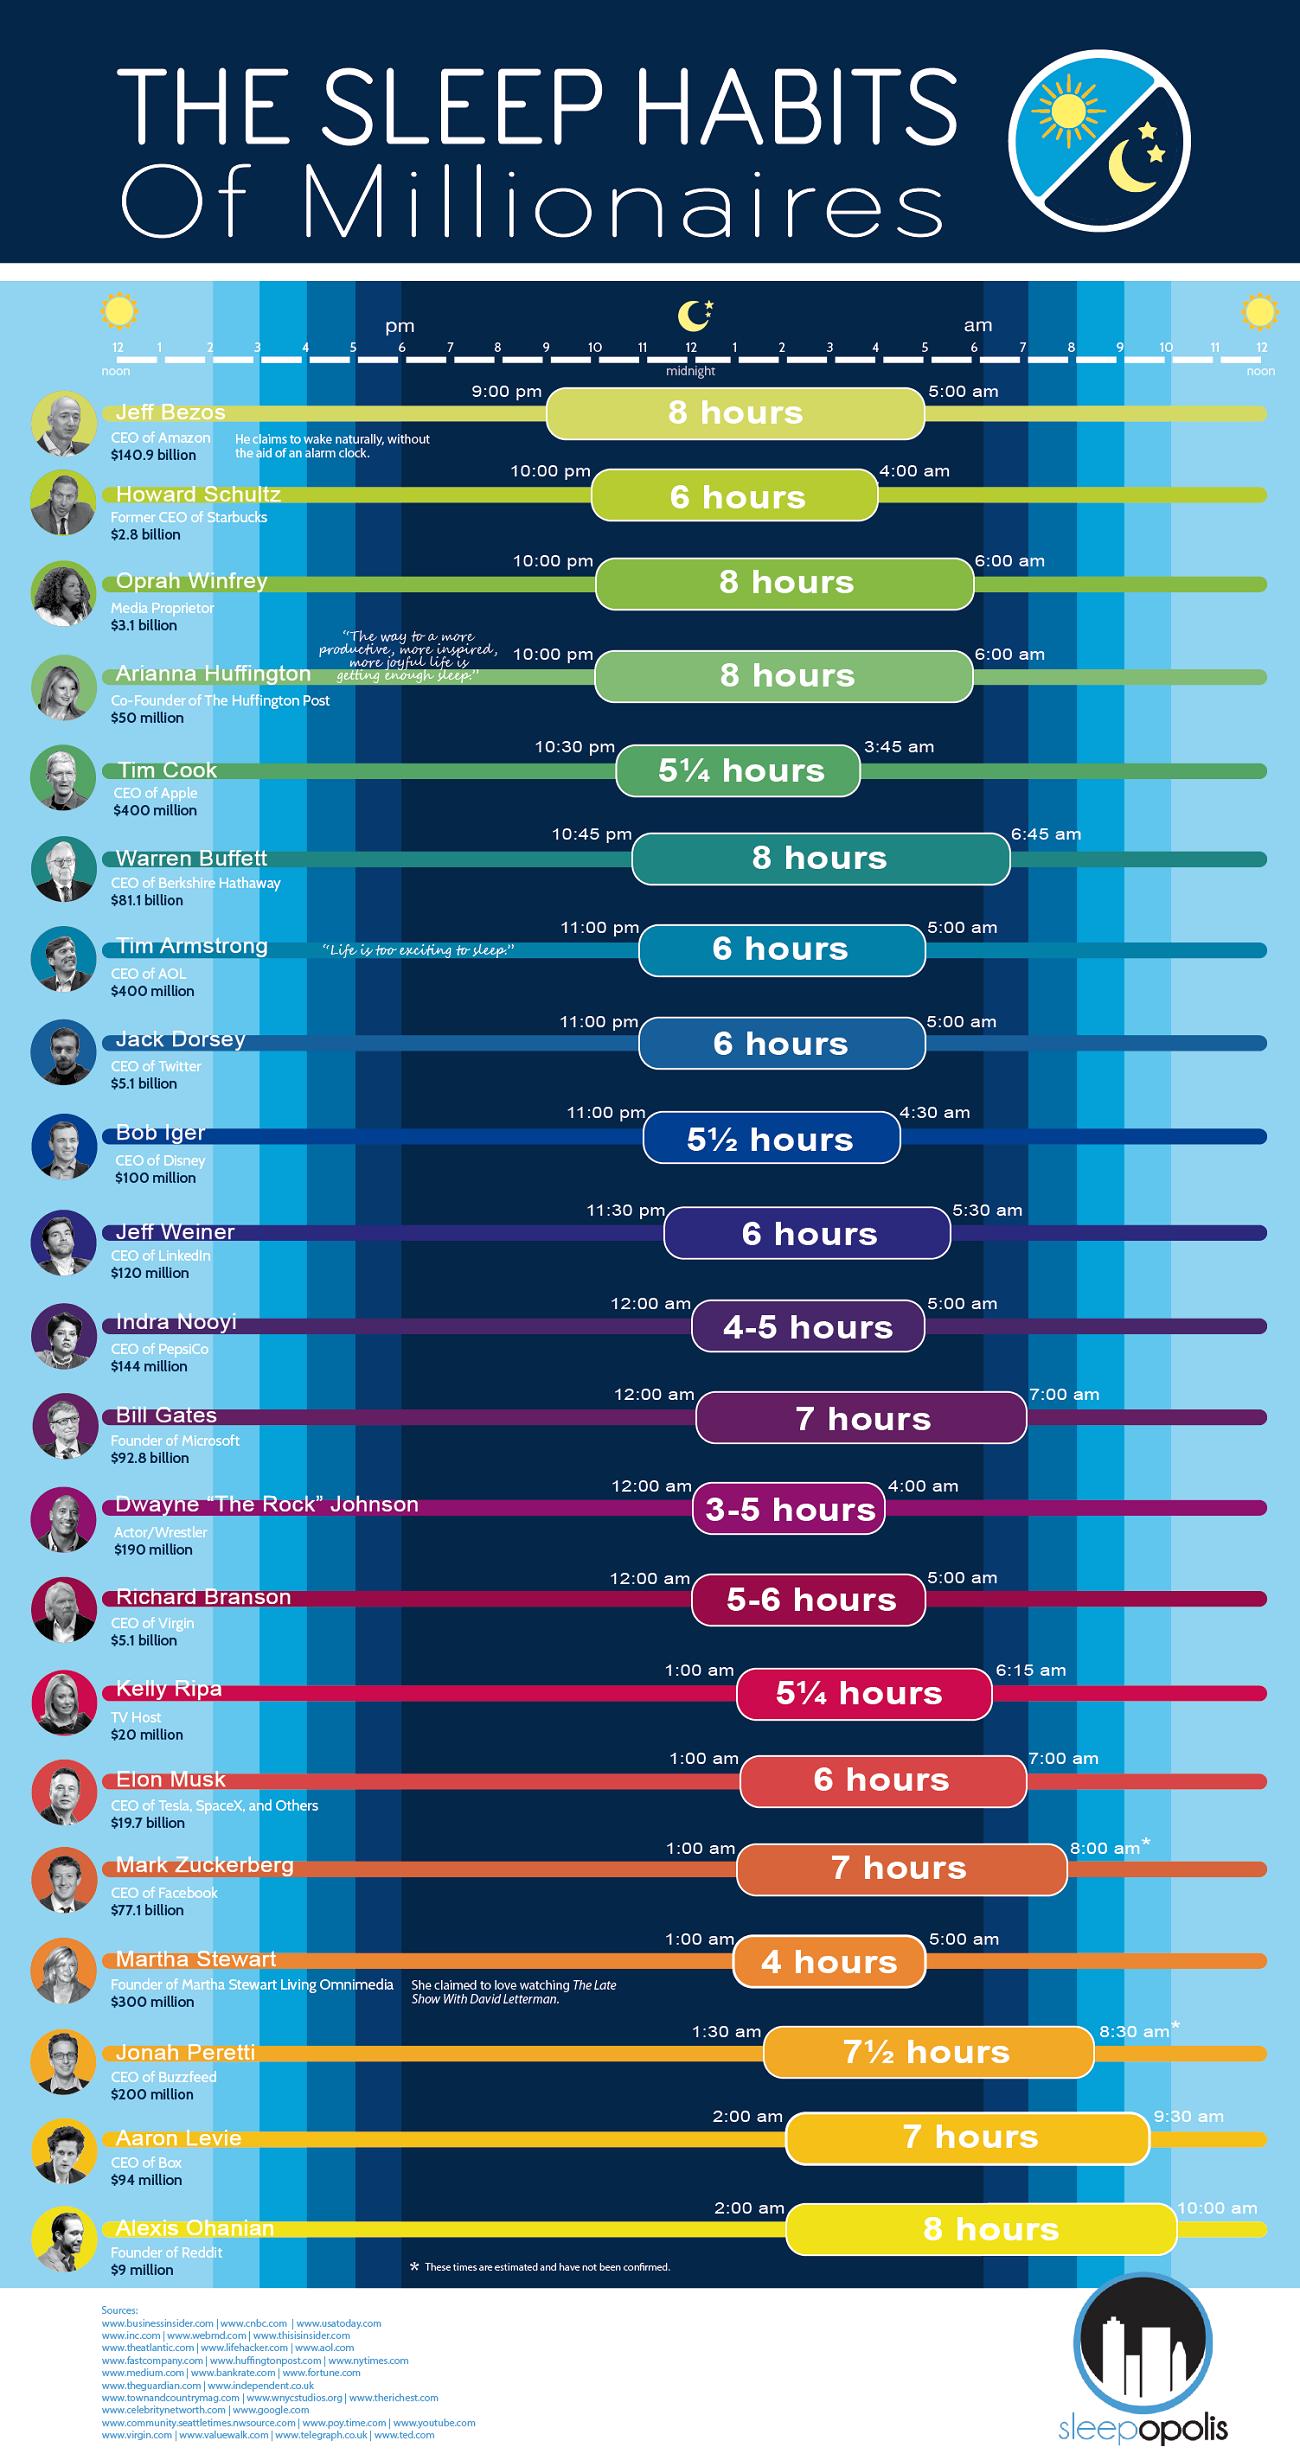 The Sleep Habits of Millionaires Infographic Sleeping